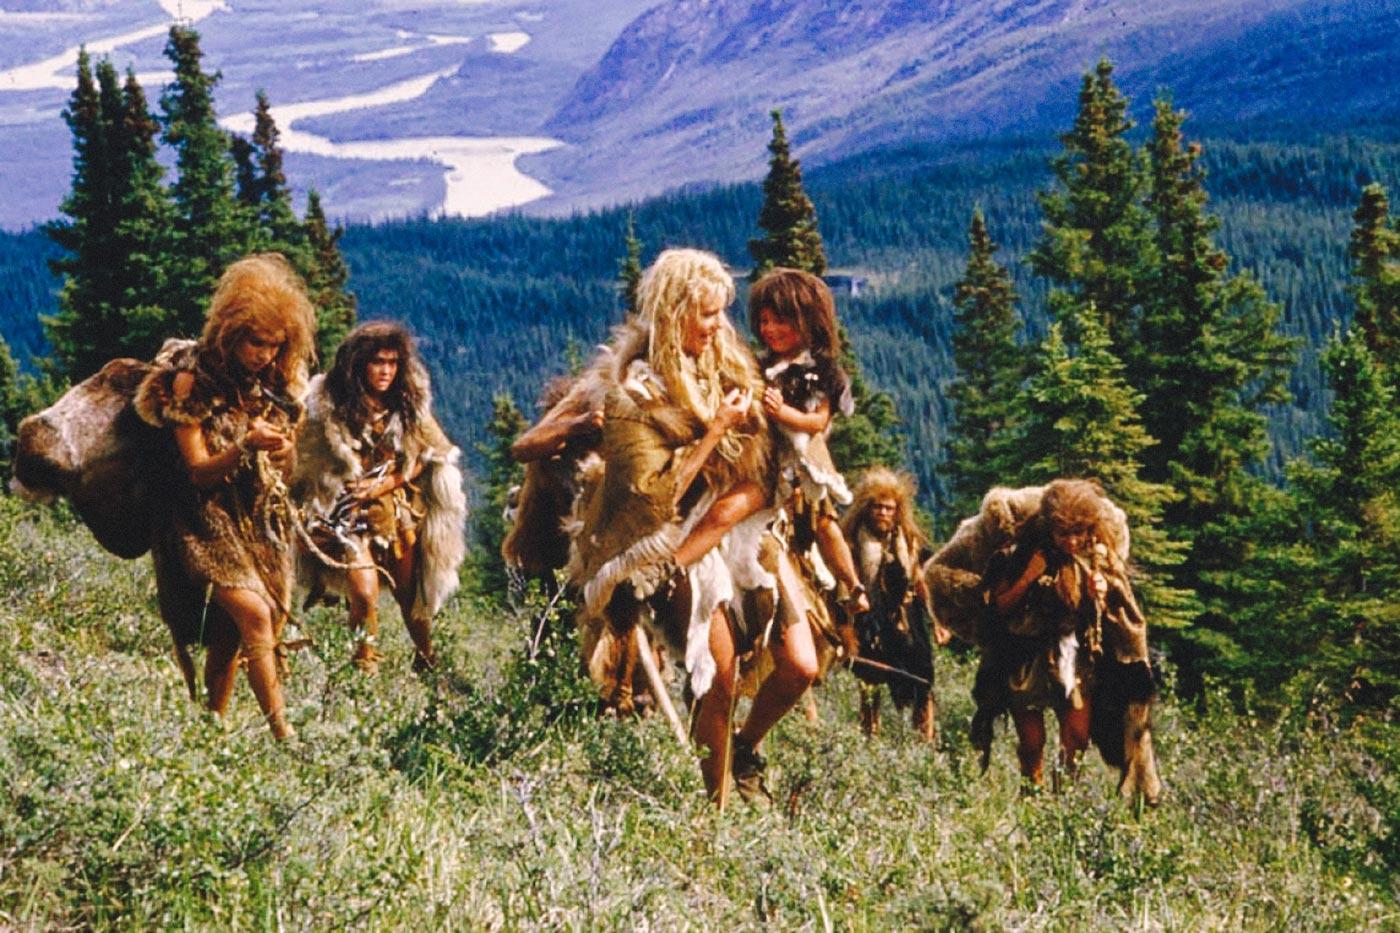 La crónica cósmica. Abuelito, ¿tú viviste en la prehistoria?